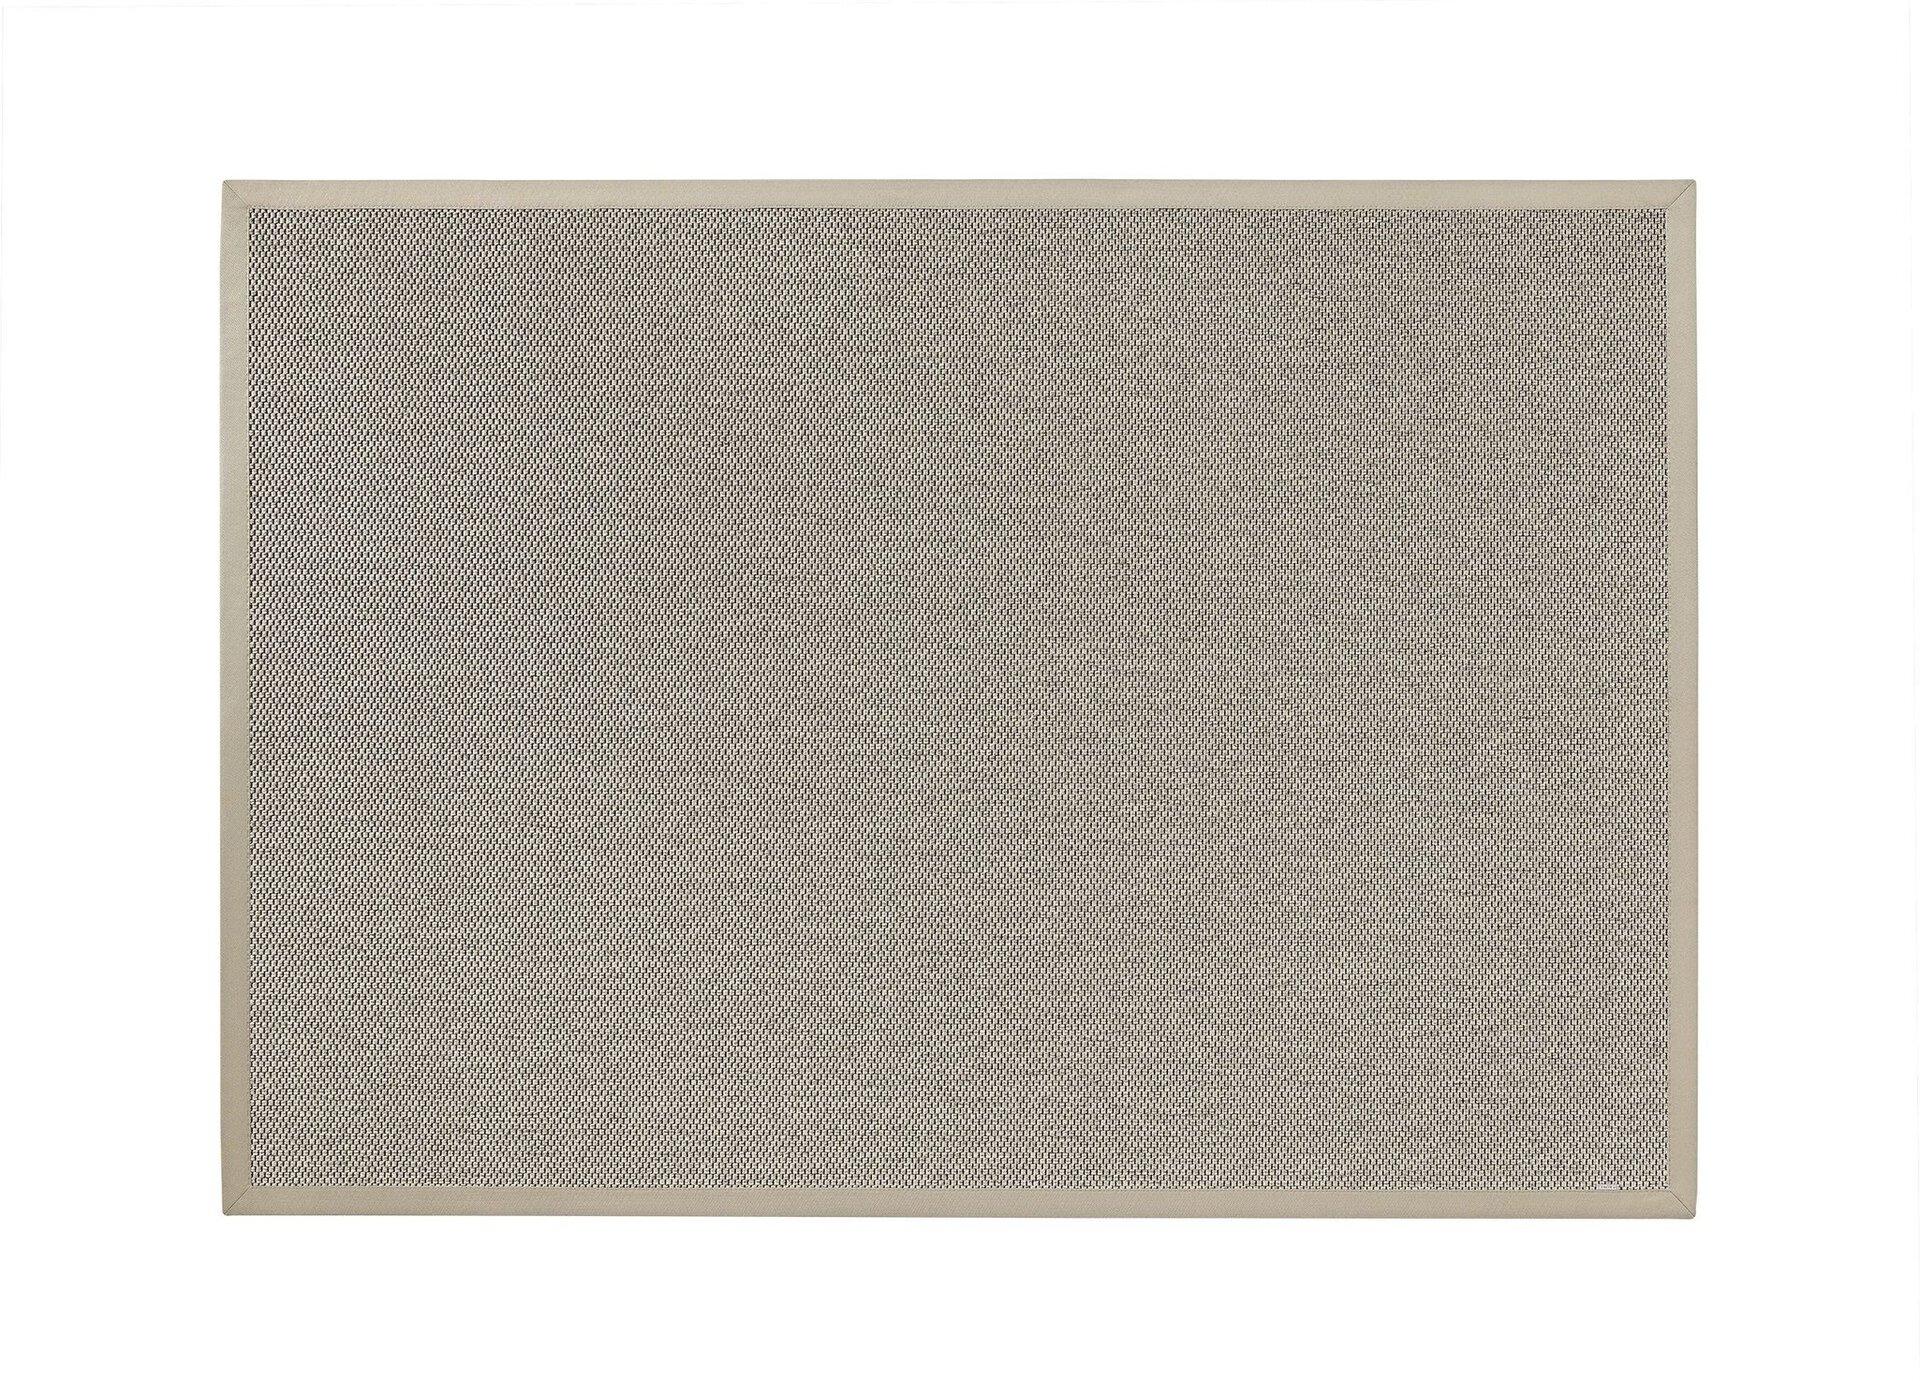 Maschinenwebteppich Naturana Panama DEKOWE Textil beige 130 x 190 cm